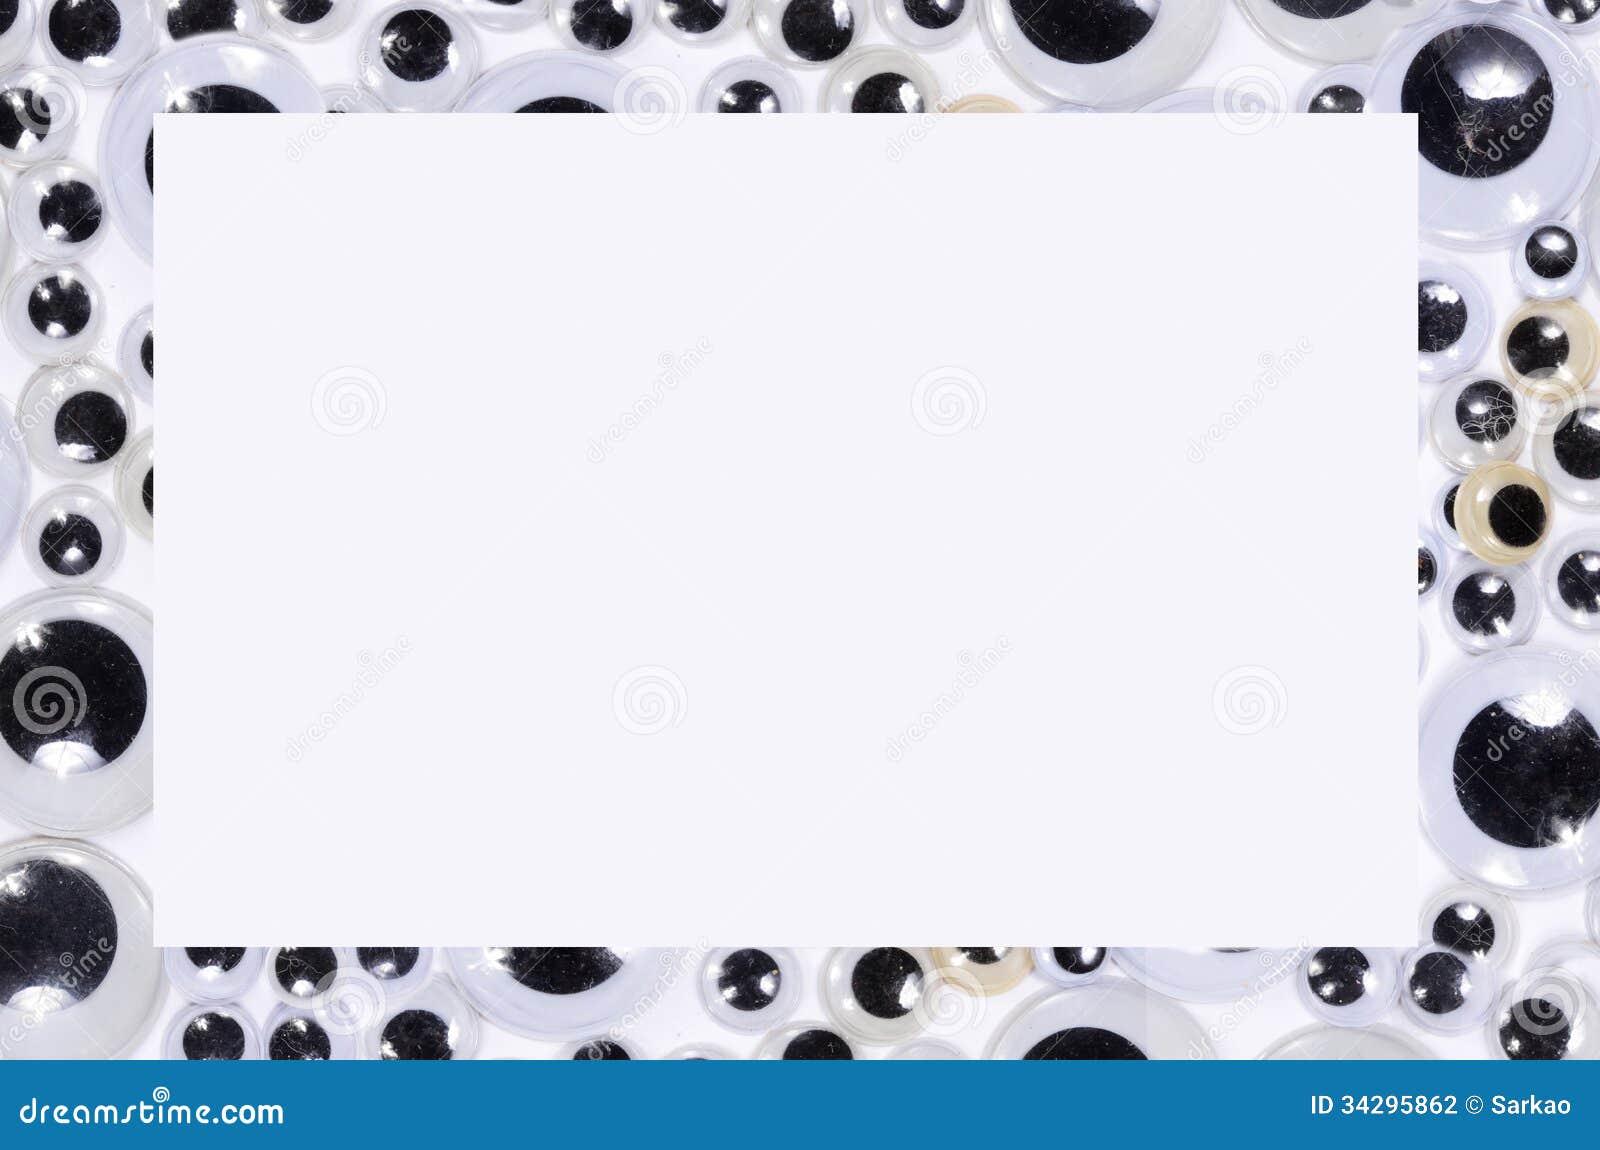 Googly eyes frame stock photo. Image of frame, craft - 34295862